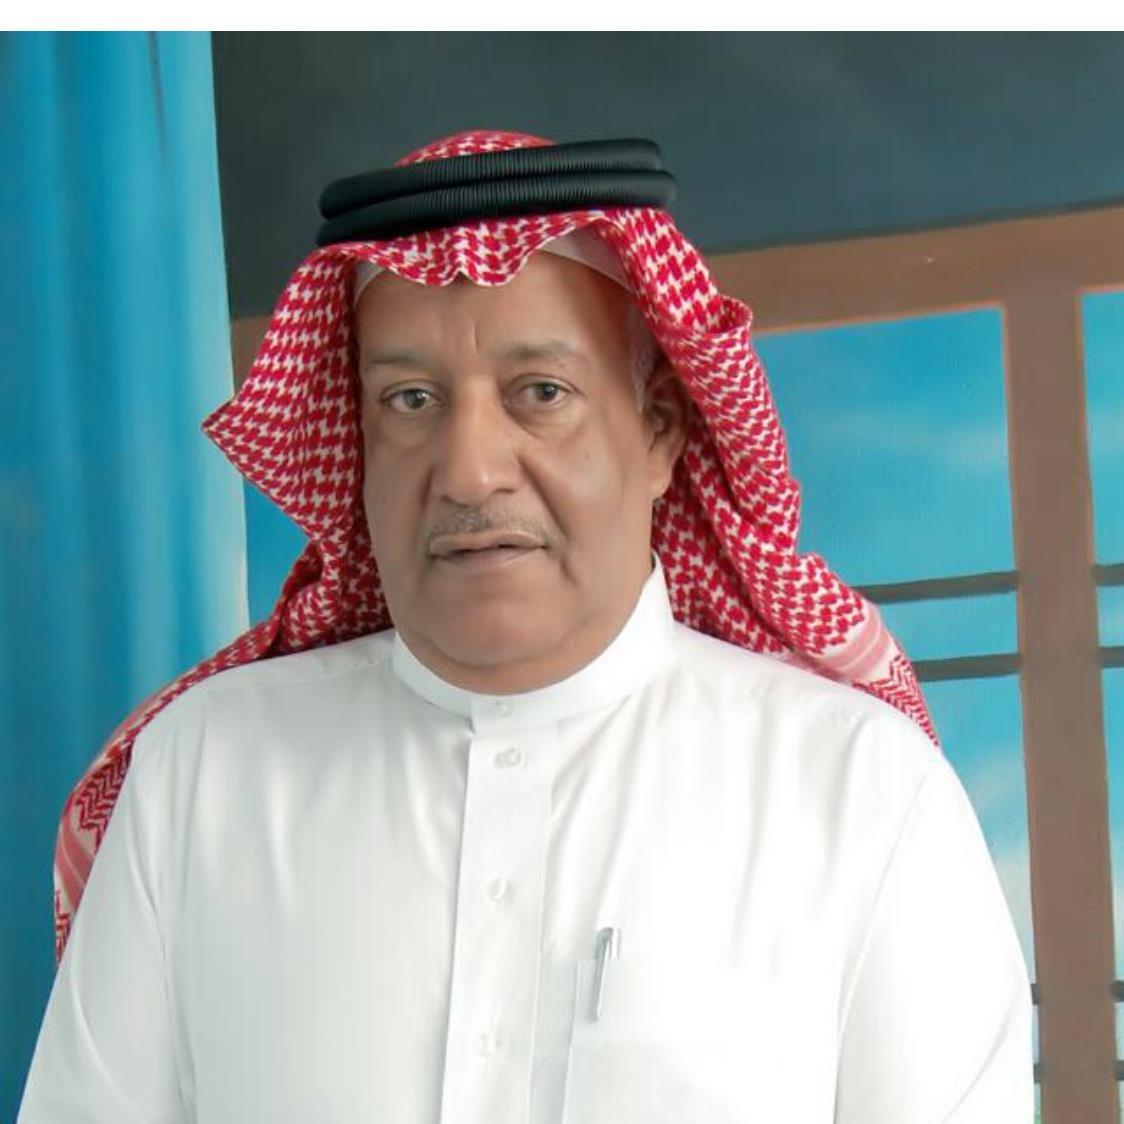 Abdullah Aburasheed عبدالله علي صالح ابو رشيد